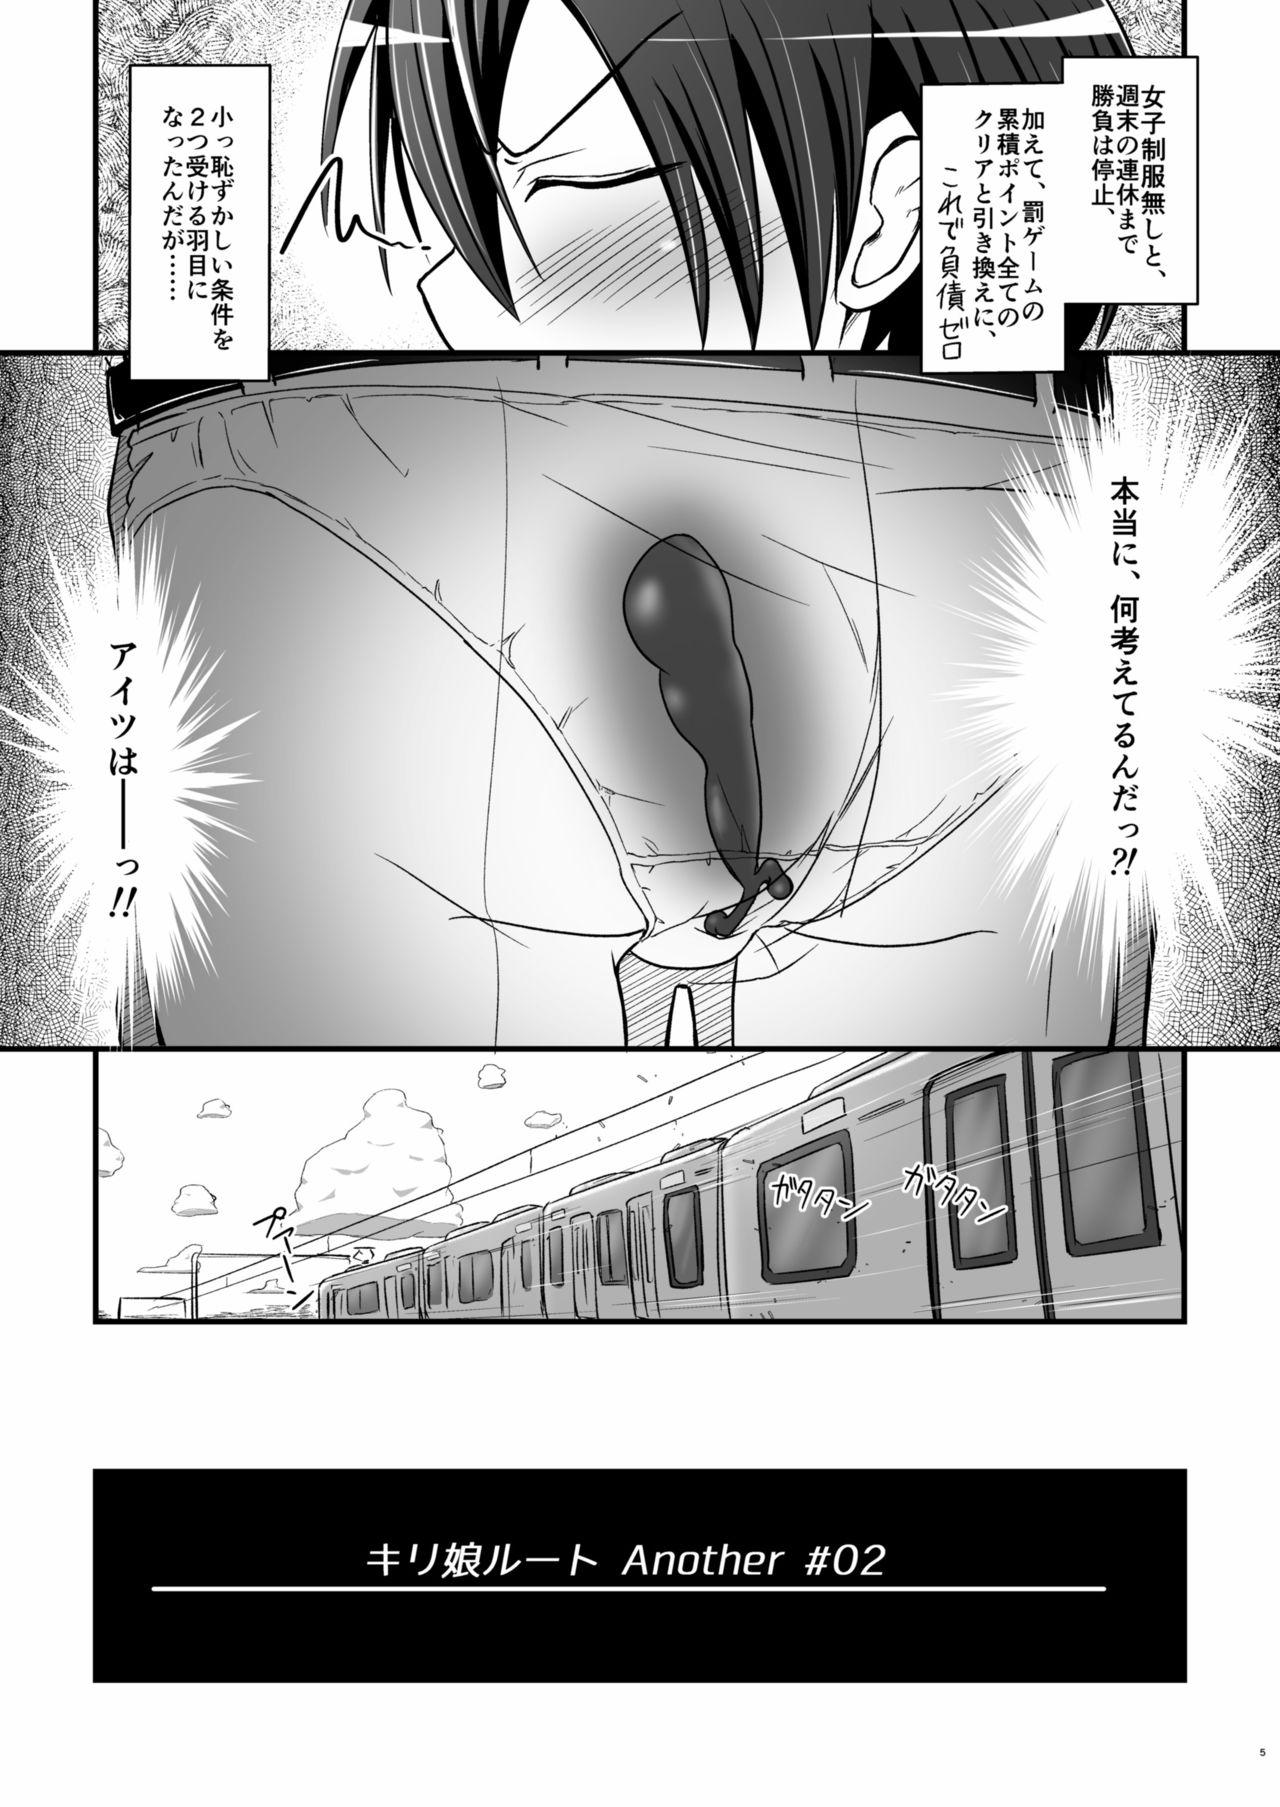 Kiriko Route Another A Part Set 37